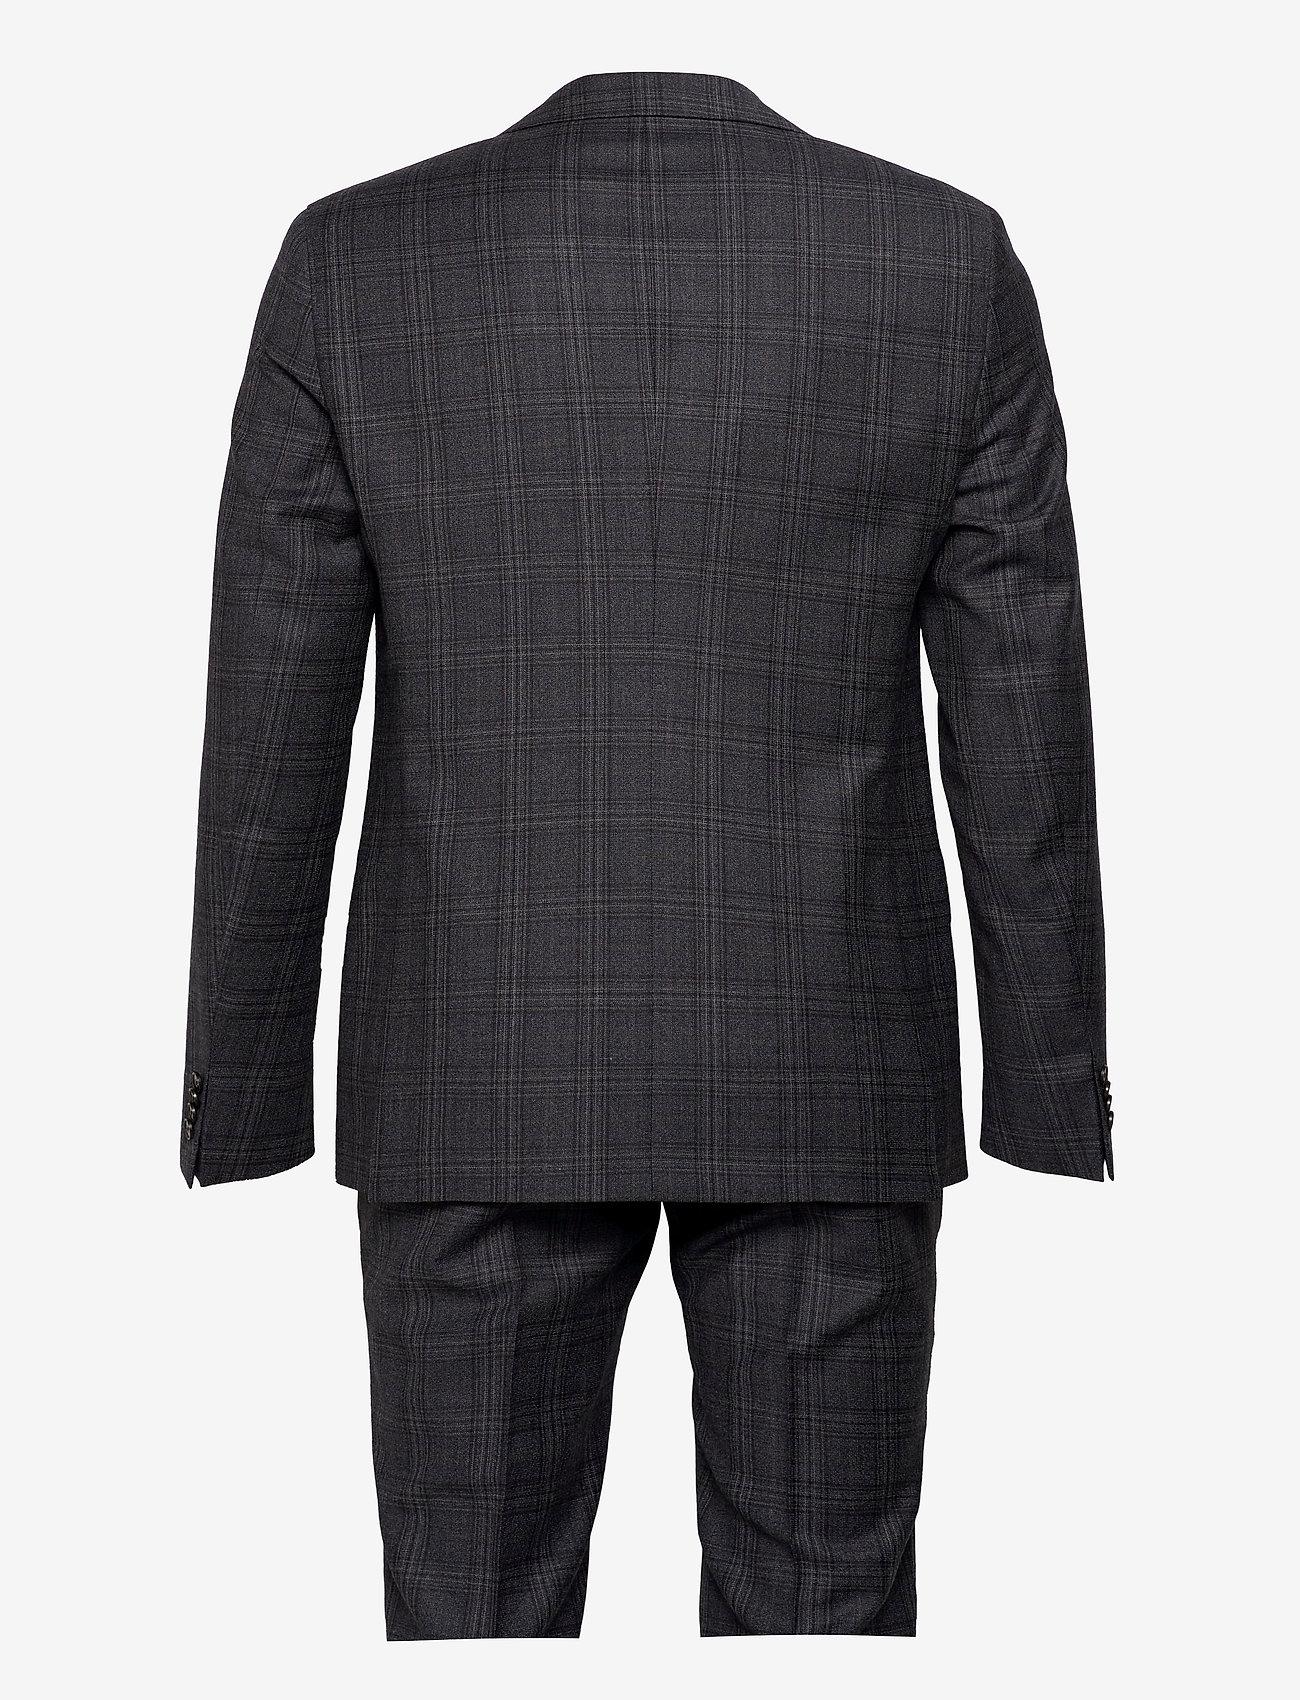 SAND - 1683 - Star Napoli-Craig Normal - enkelknäppta kostymer - grey - 1